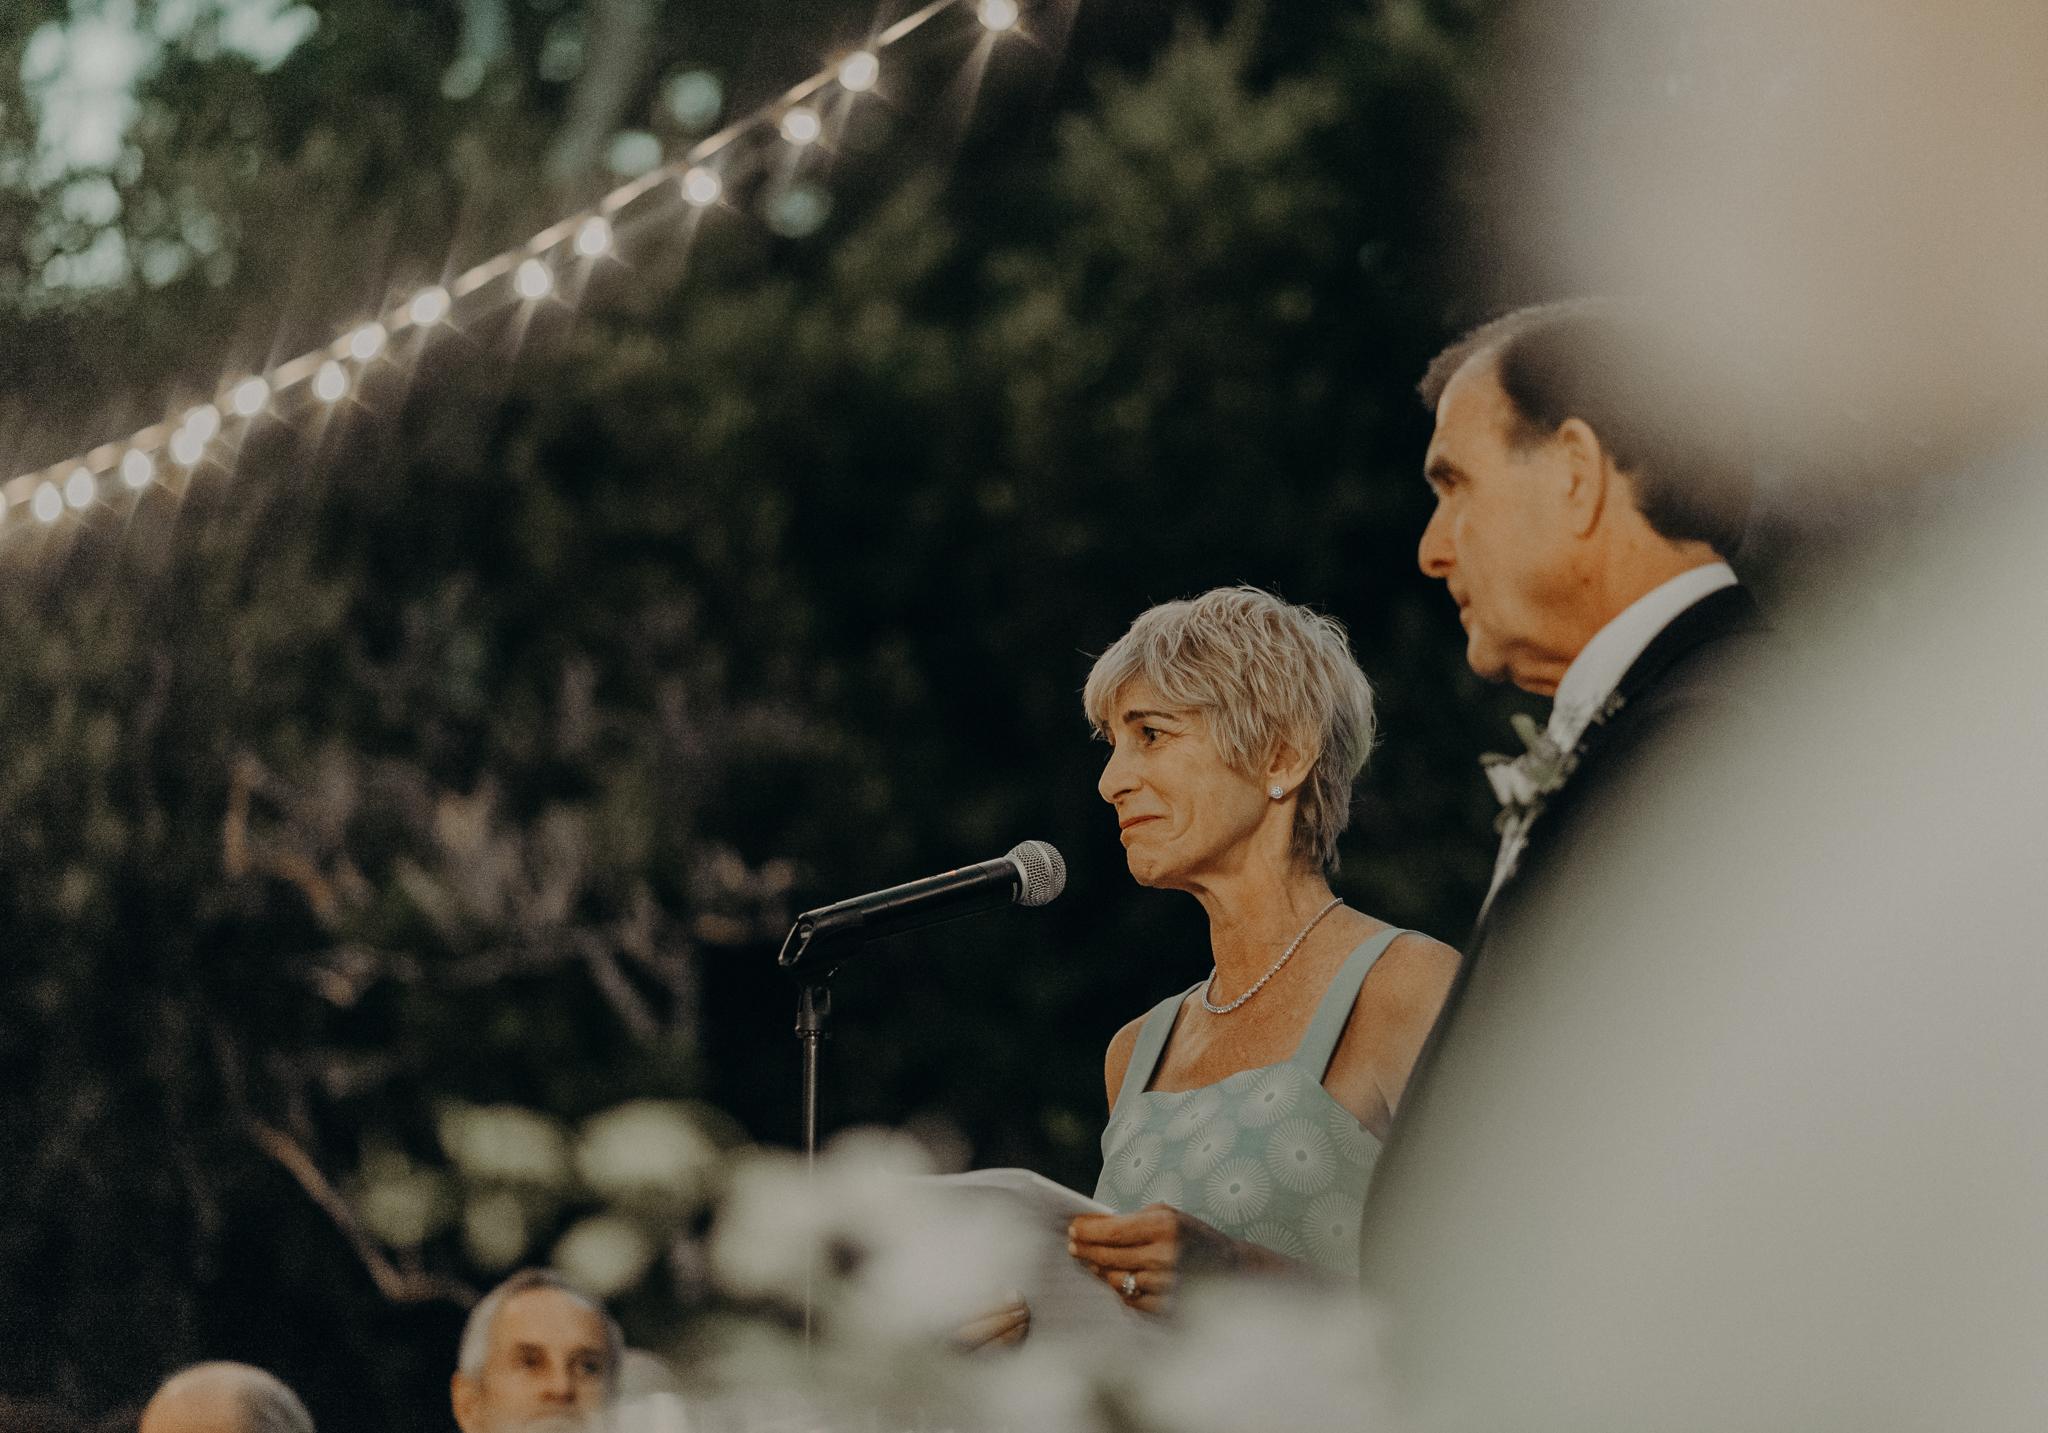 Isaiah + Taylor Photography - Private Estate Backyard Wedding - Beverly Hills - Los Angeles Wedding Photographer - 129.jpg